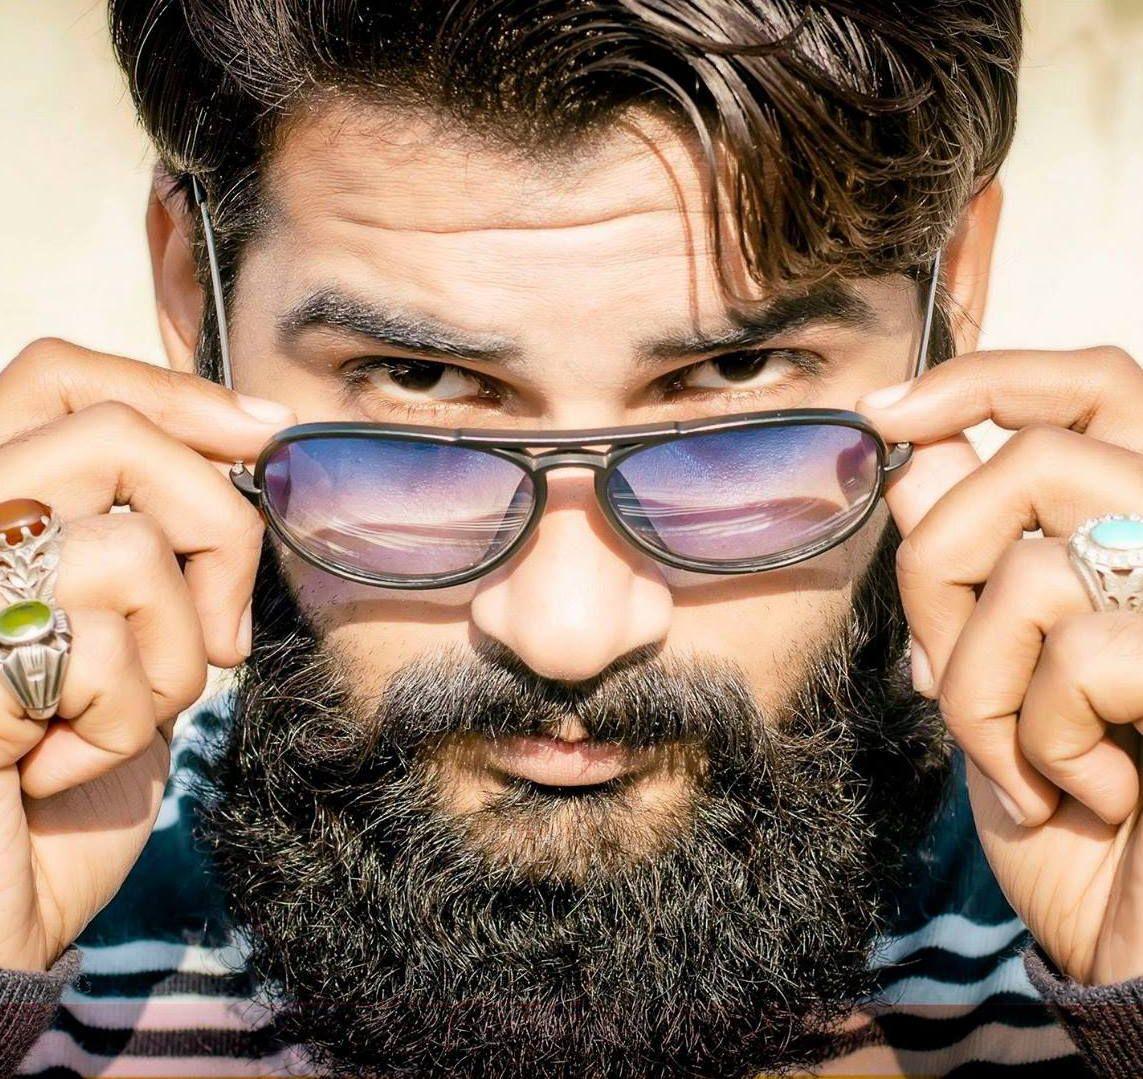 Haircuts for men with widows peak bearditorium ucbj ud  beards  pinterest  beard styles